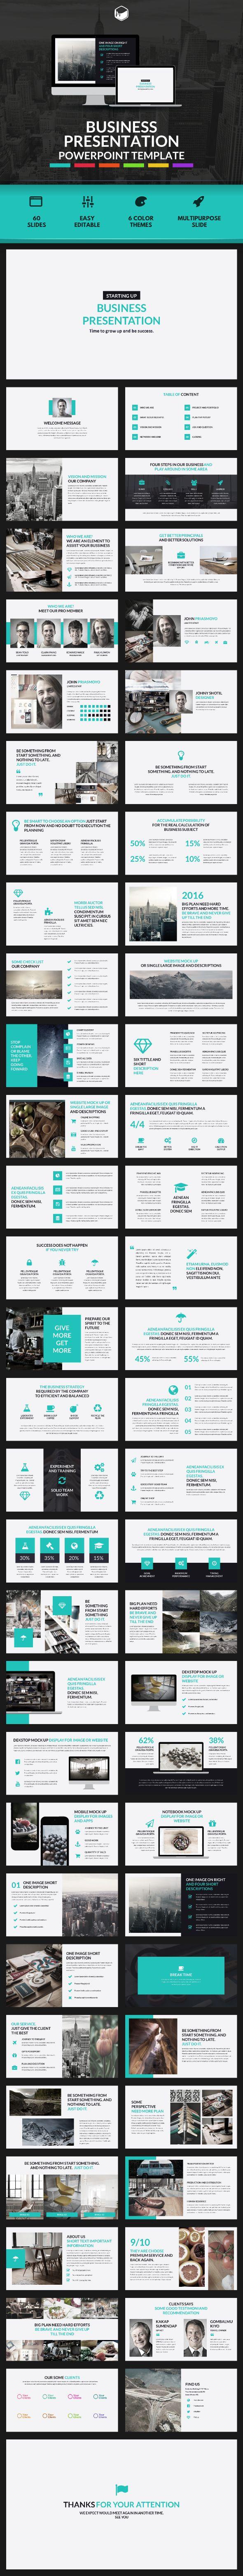 The 25 best business presentation ideas on pinterest business business presentation powerpoint template business powerpoint templates download here https toneelgroepblik Image collections